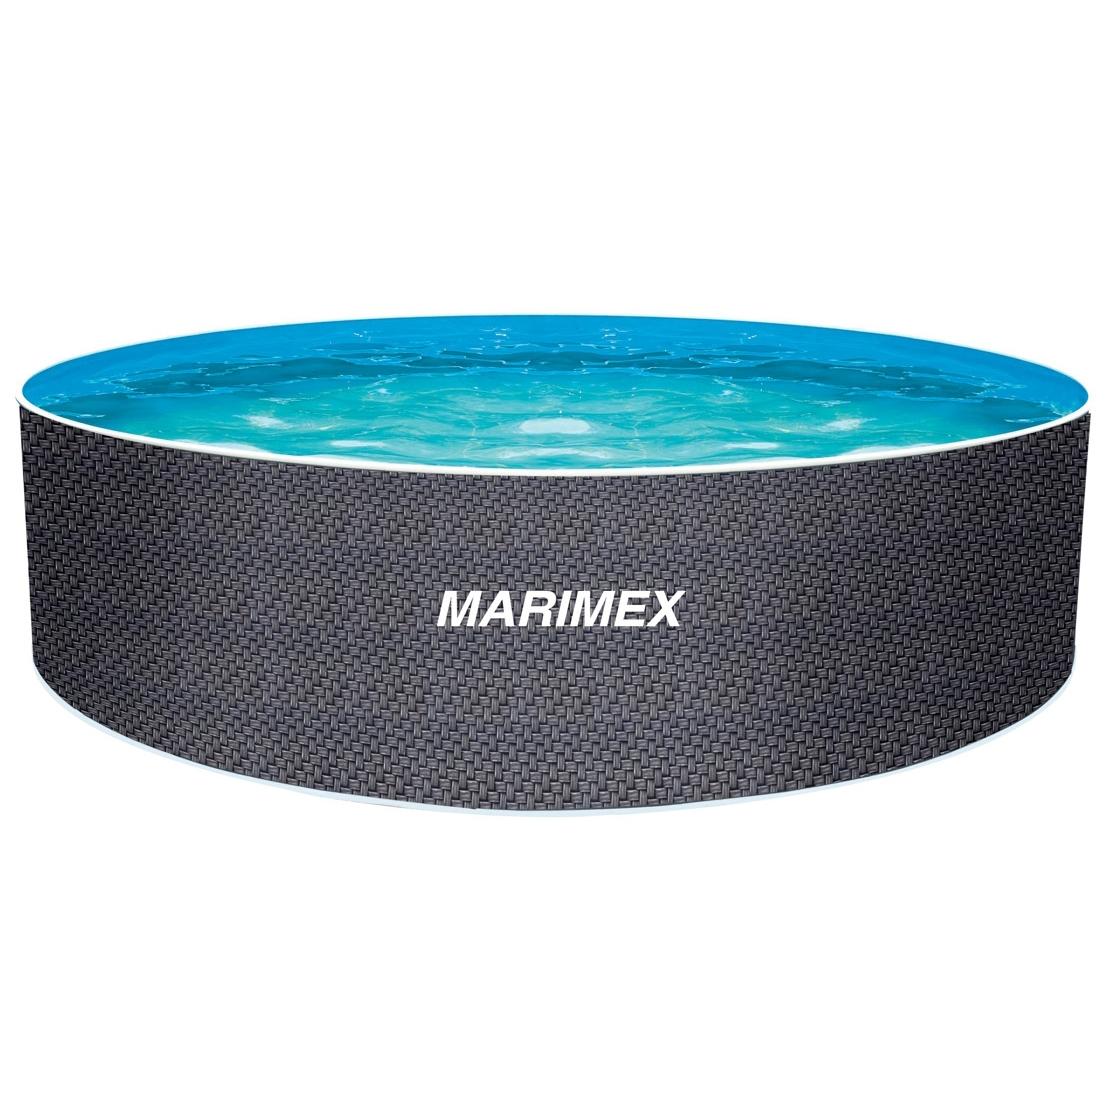 MARIMEX Orlando Bazén ø 3,66 x 1,22 m bez filtrace - motiv ratan MARIMEX 10340263